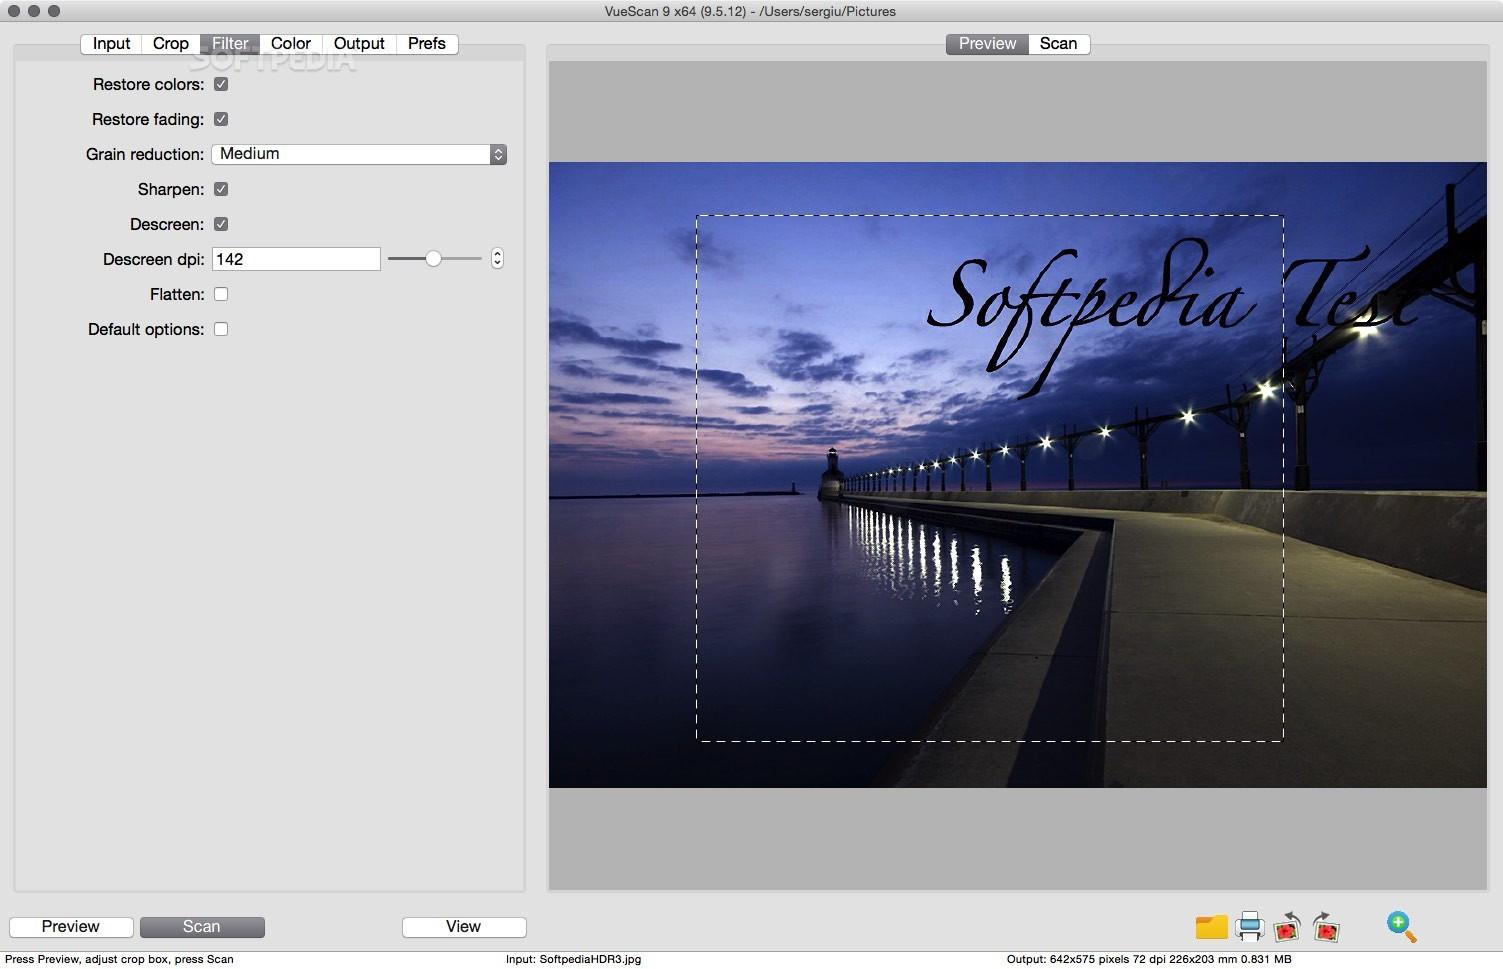 Mac os x 10 6 snow leopard dmg download torrent | Mac OS X 10 6 Snow